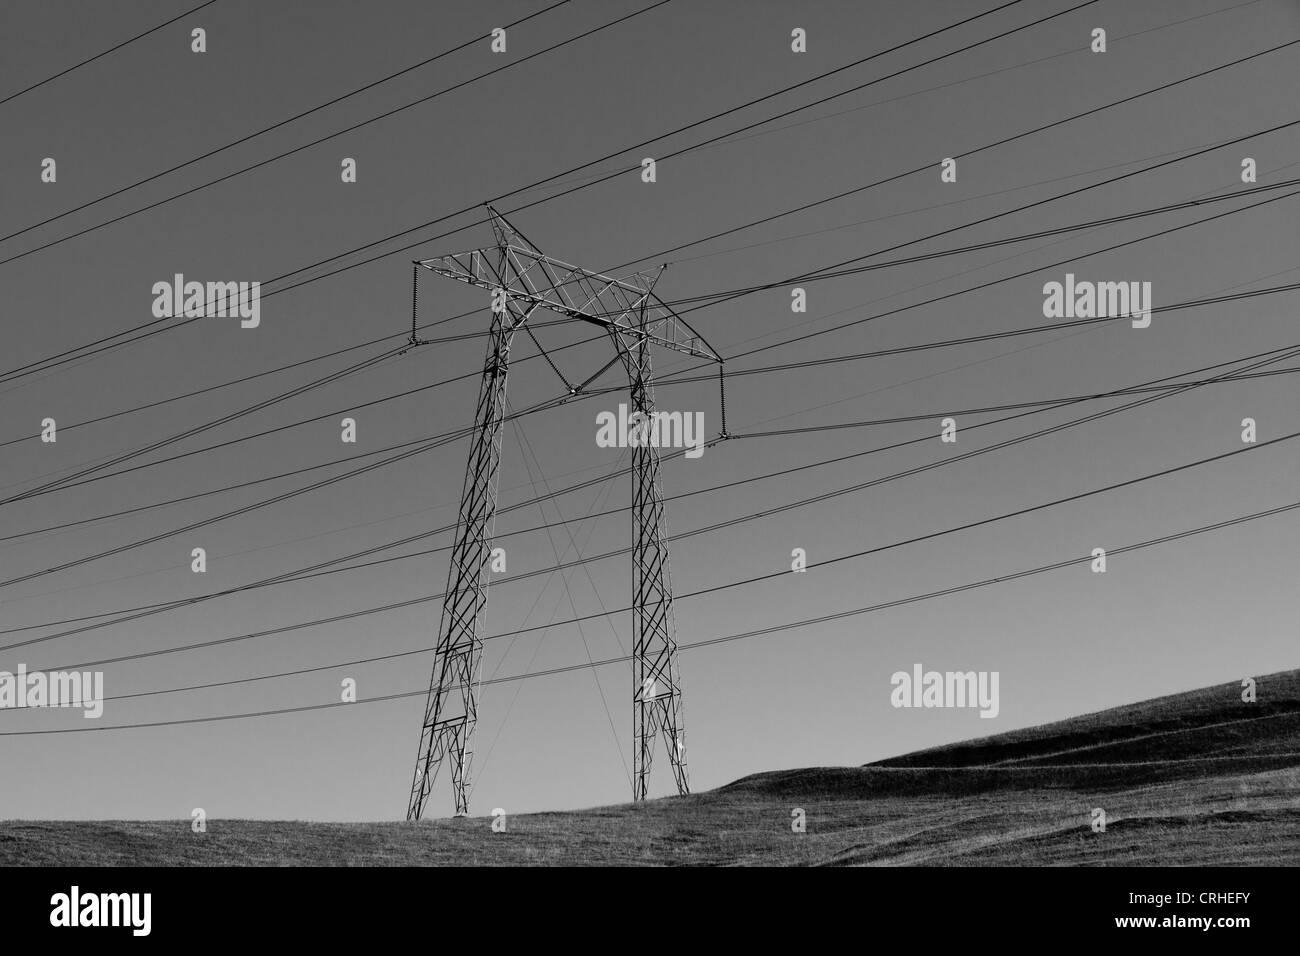 Pylon and power lines - California USA - Stock Image